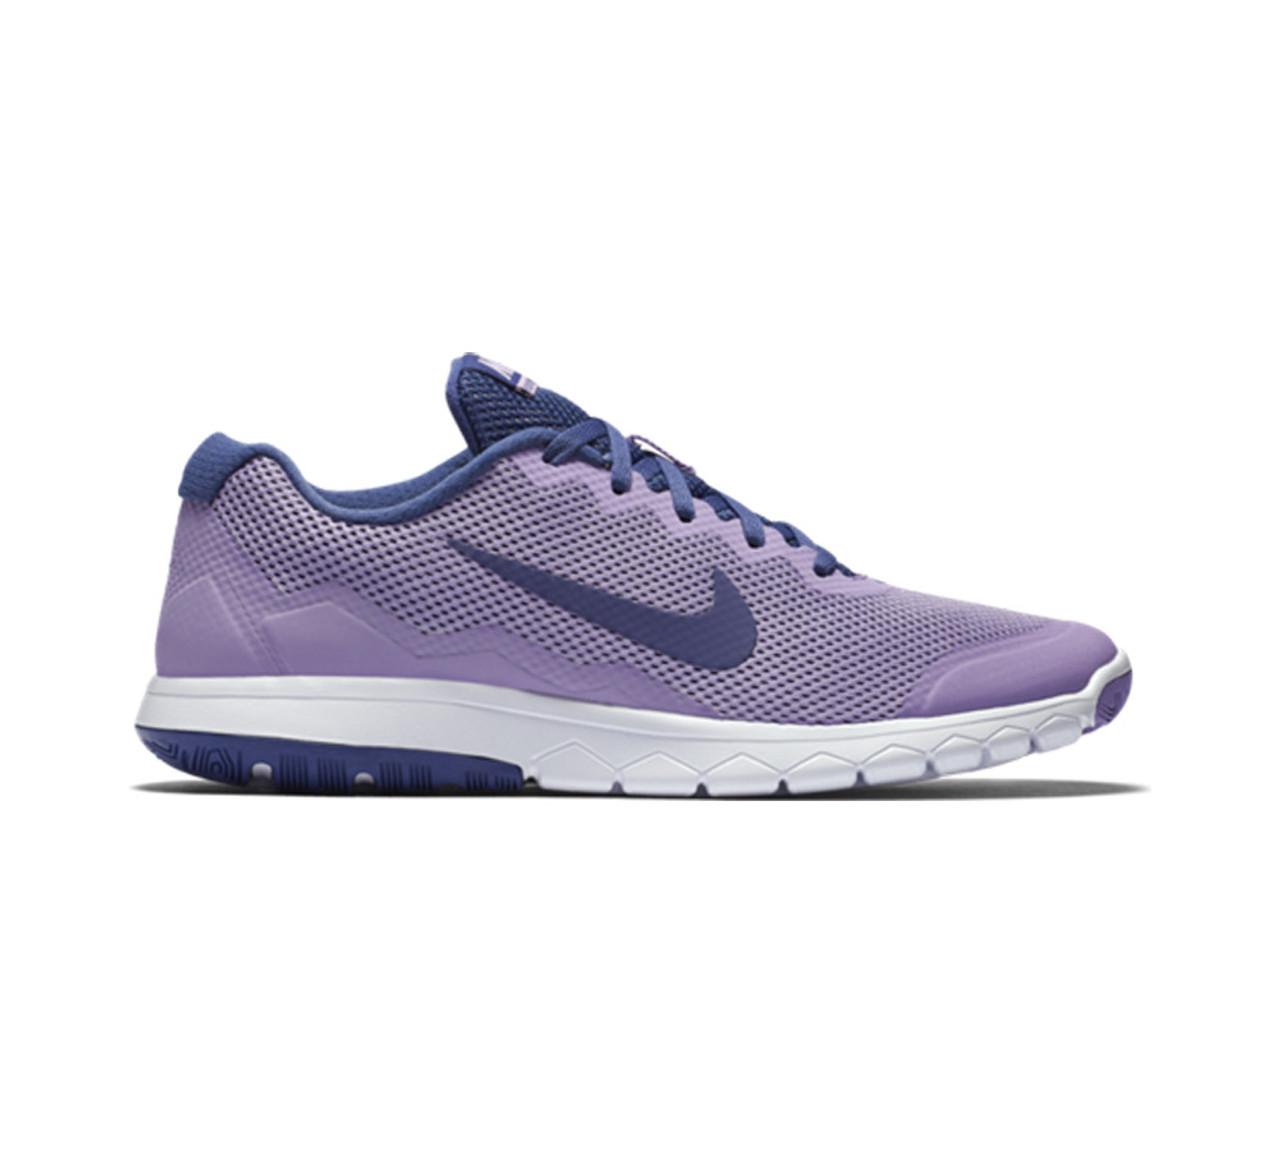 02a30cefd53e Nike Women s Flex Experience RN 4 Running Shoe Lilac Purple - Shop now    Shoolu